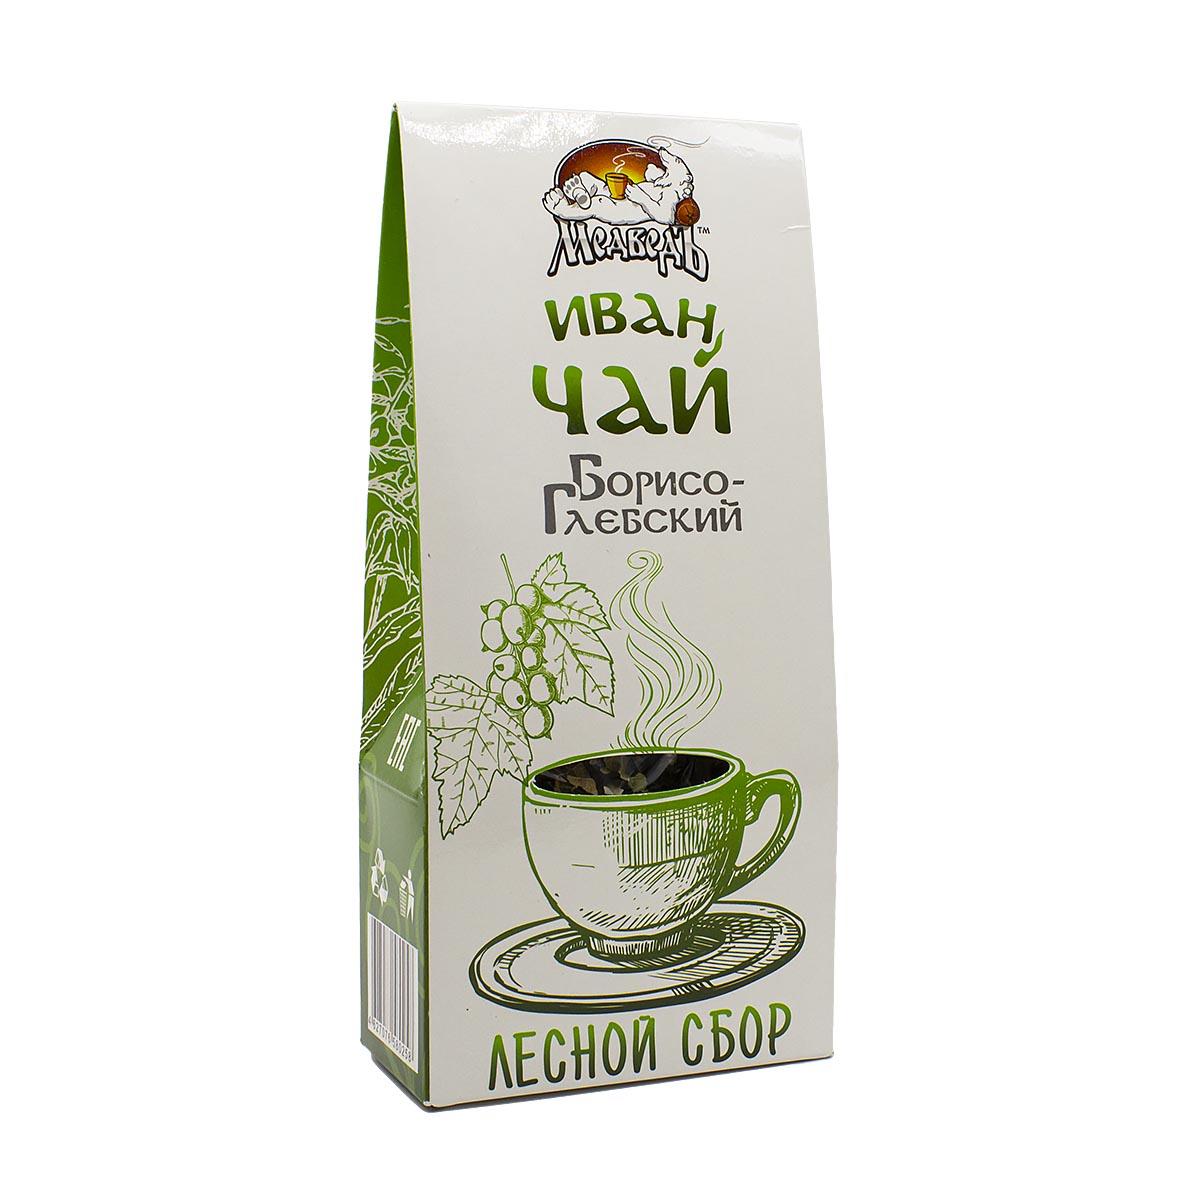 Иван-чай Борисоглебский